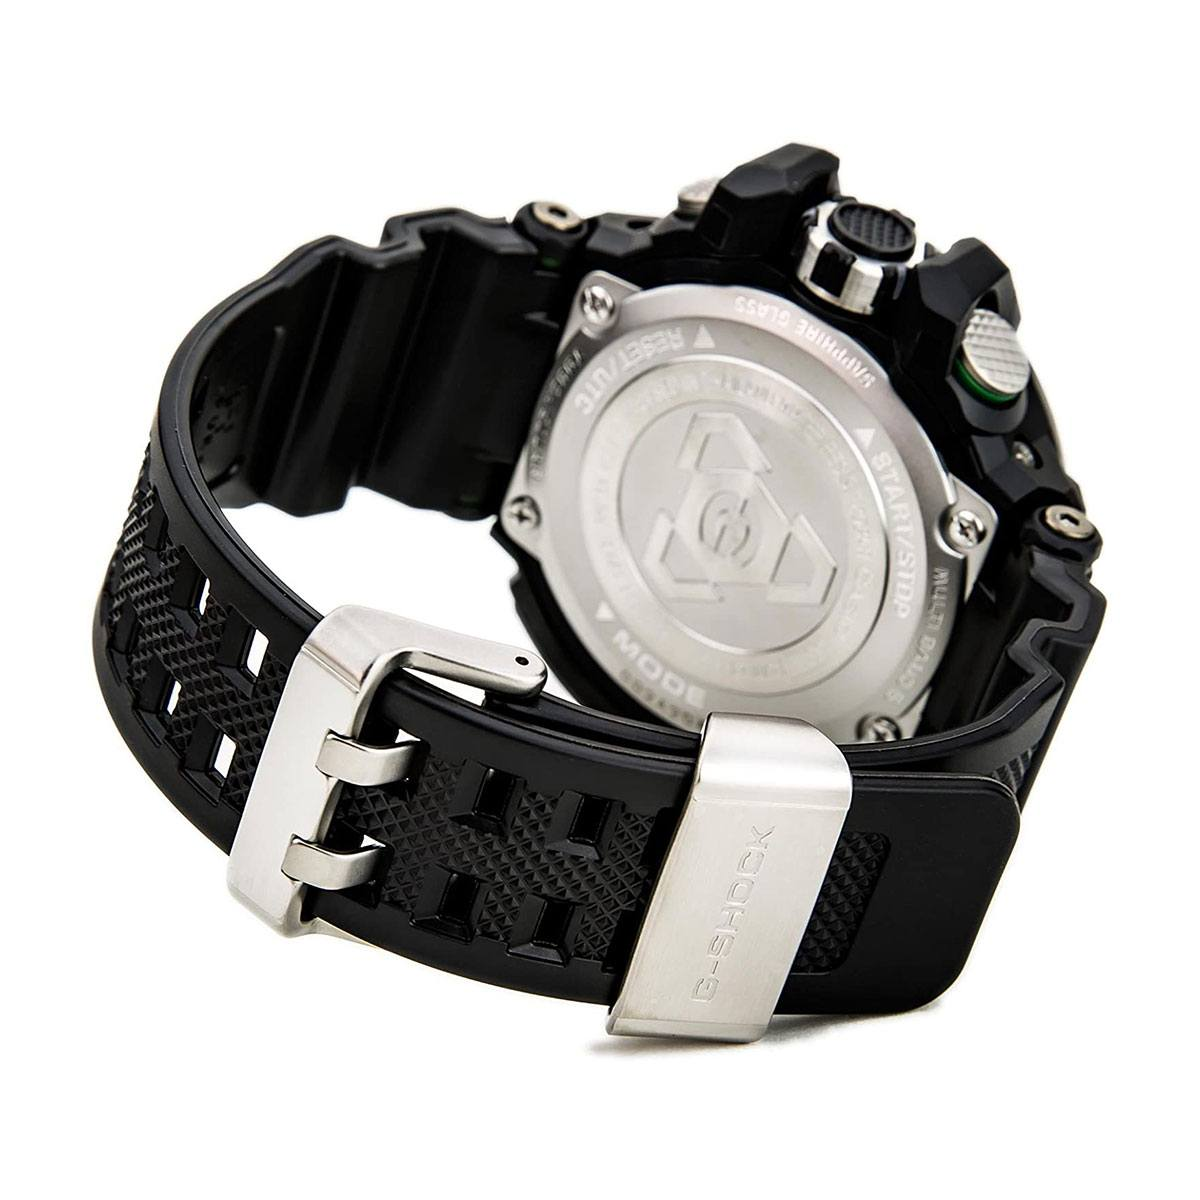 Часовник Casio G-Shock Gravitymaster GW-A1100-1A3ER